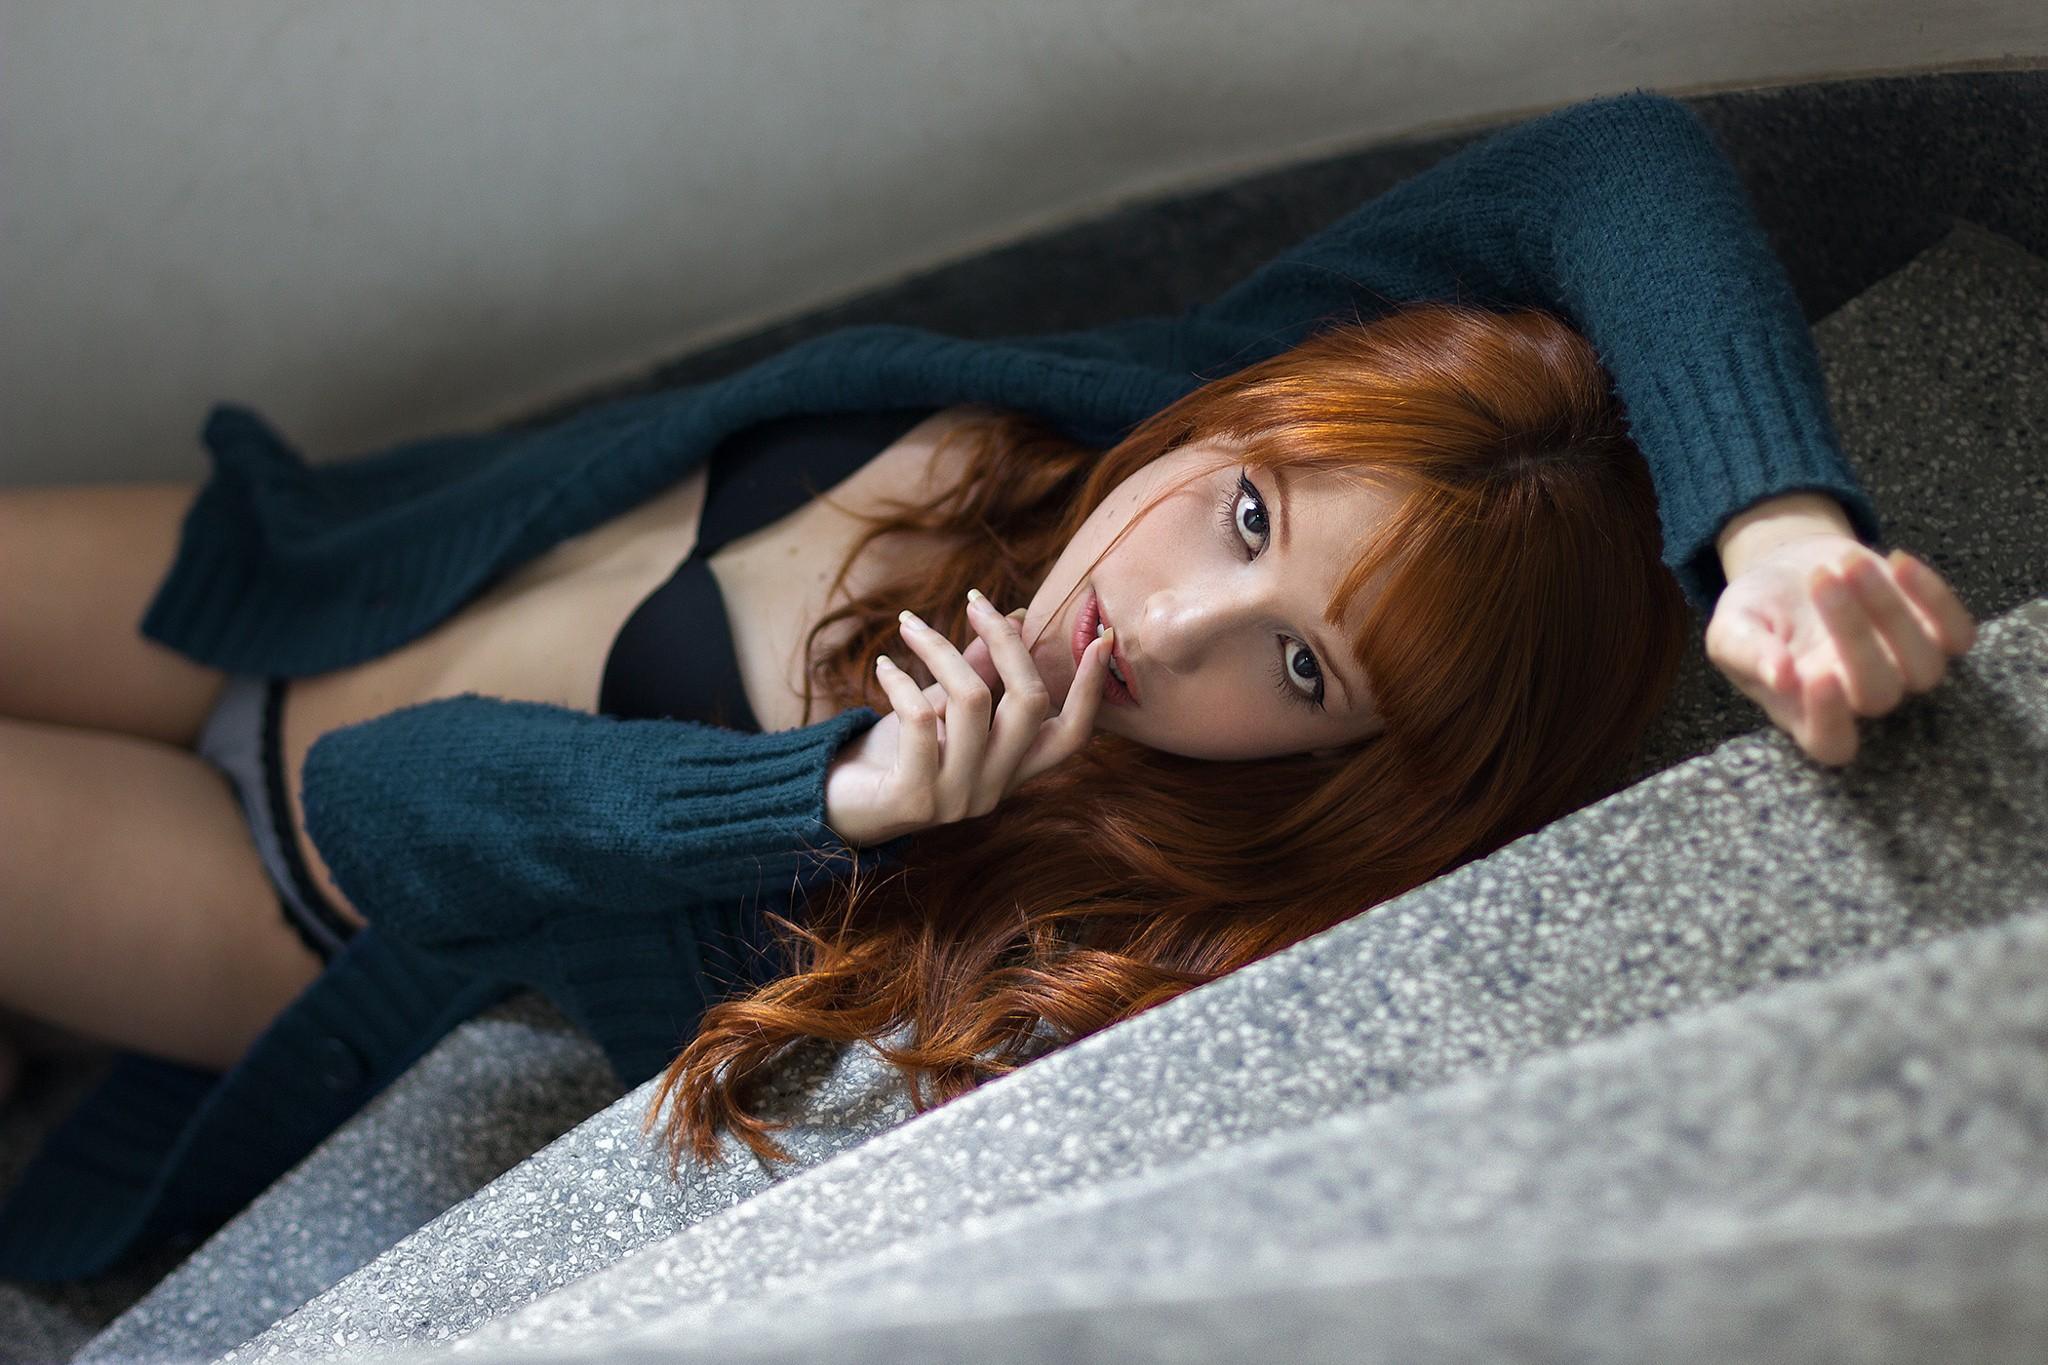 People 2048x1365 women panties black bras sweater redhead open shirt lingerie lying on back stairs looking at viewer bra blue sweater